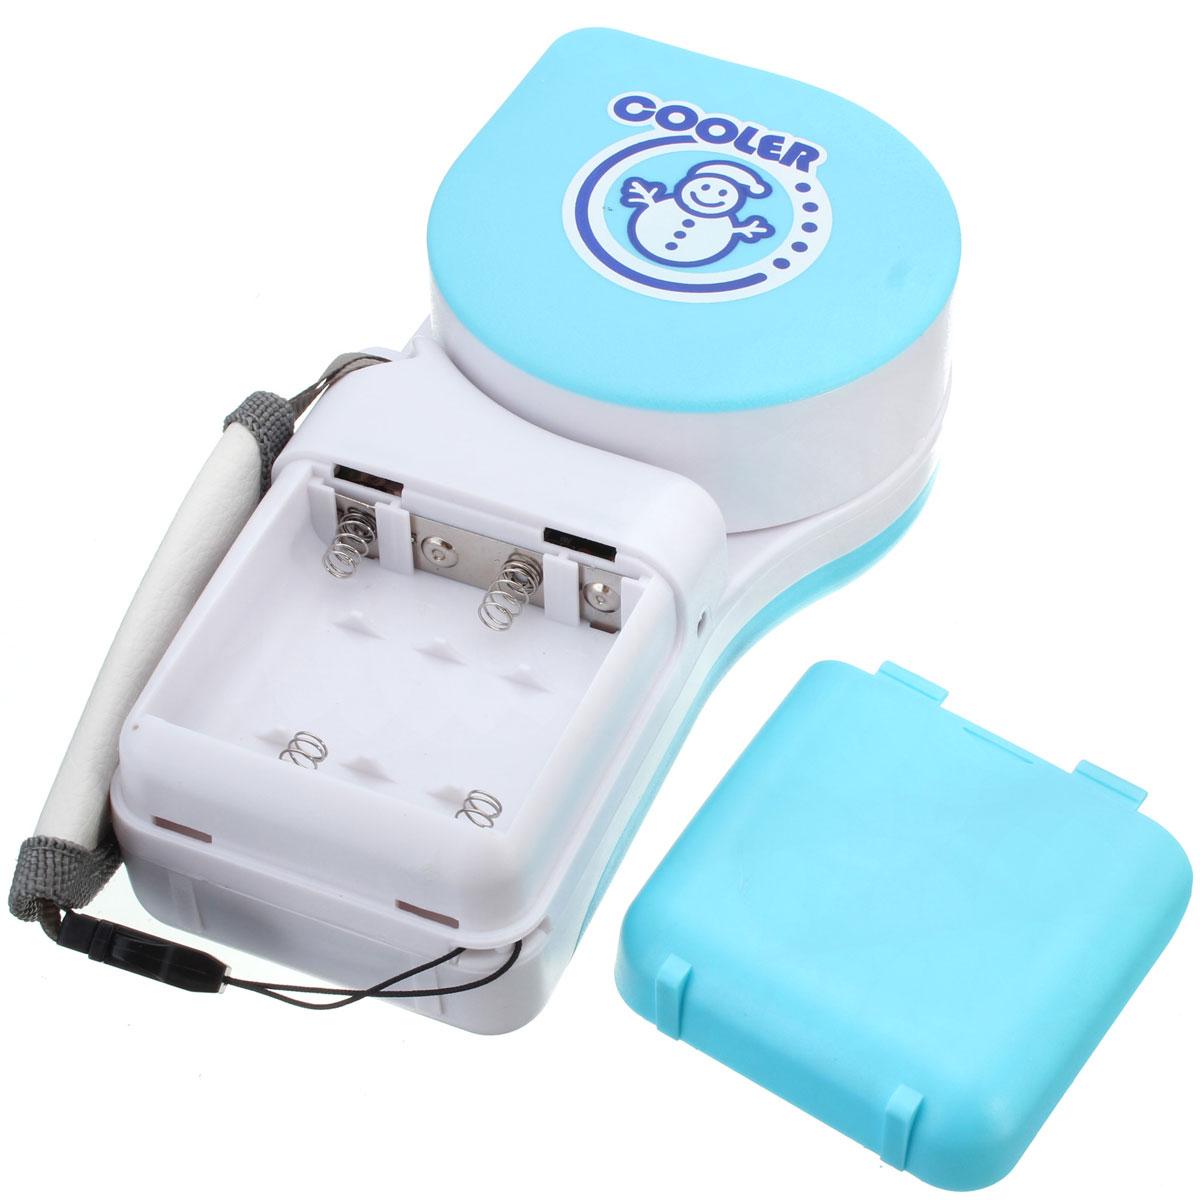 Cute Air Fans : Cute portable mini hand held handy cooler fan usb battery